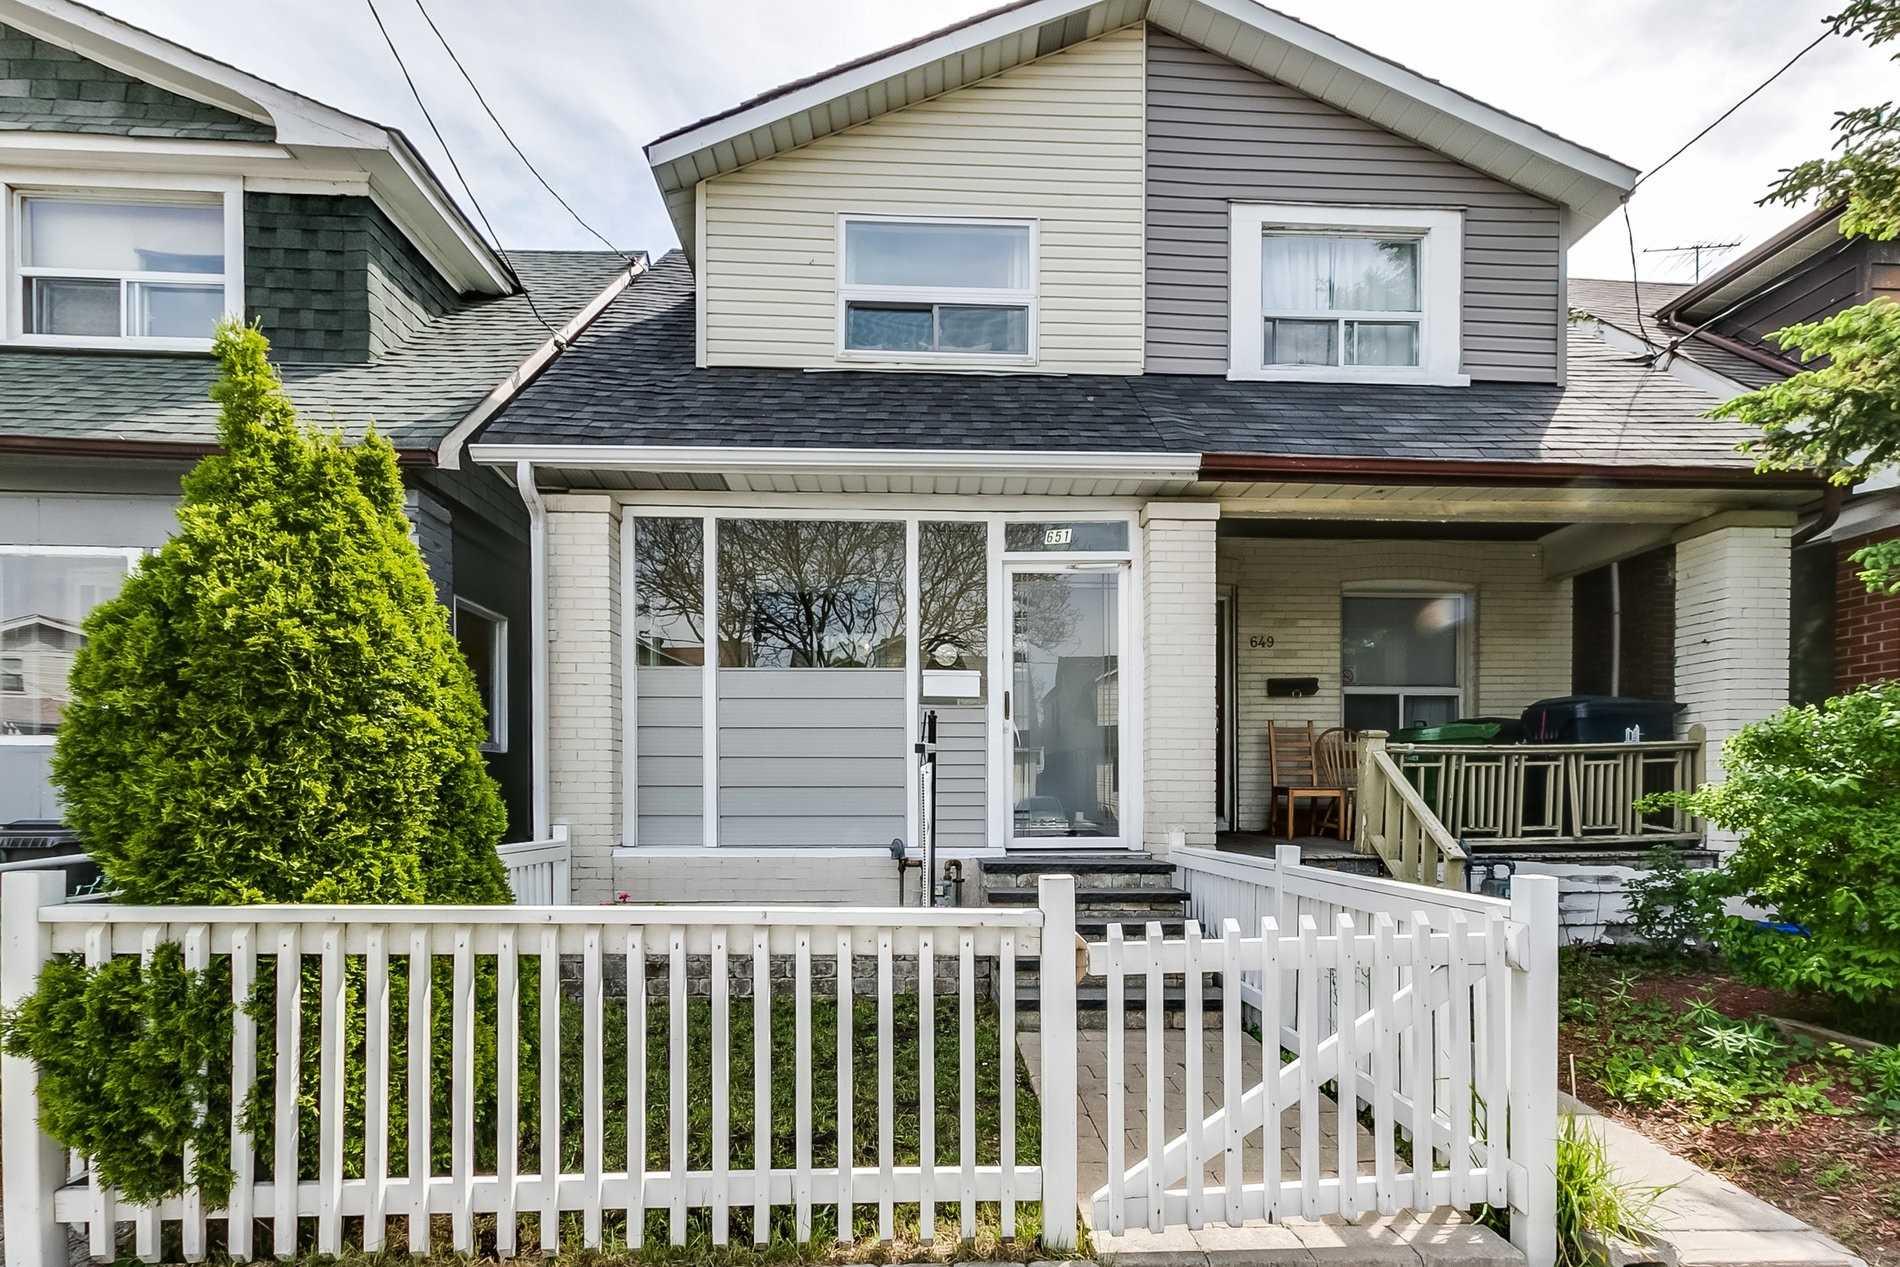 House For Sale 651 Coxwell Ave, M4C3B8, Woodbine Corridor, Toronto